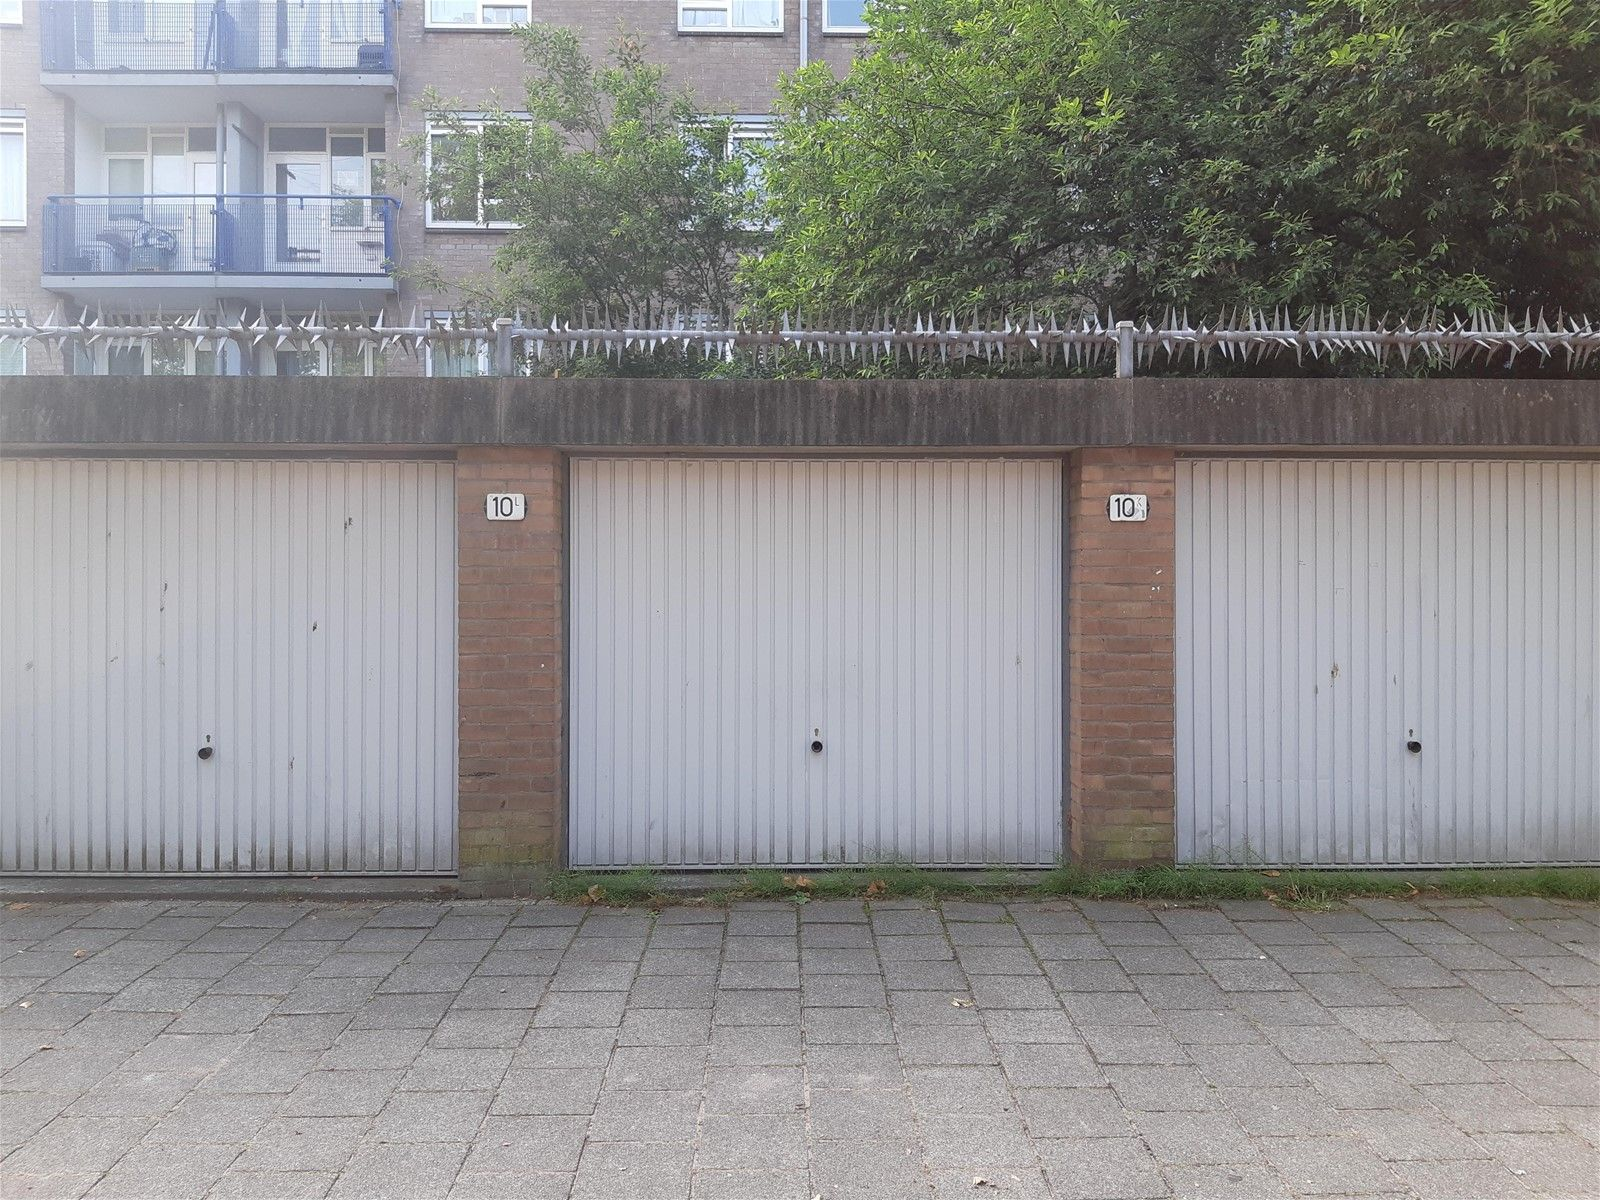 Conradstraat 10L, Amsterdam